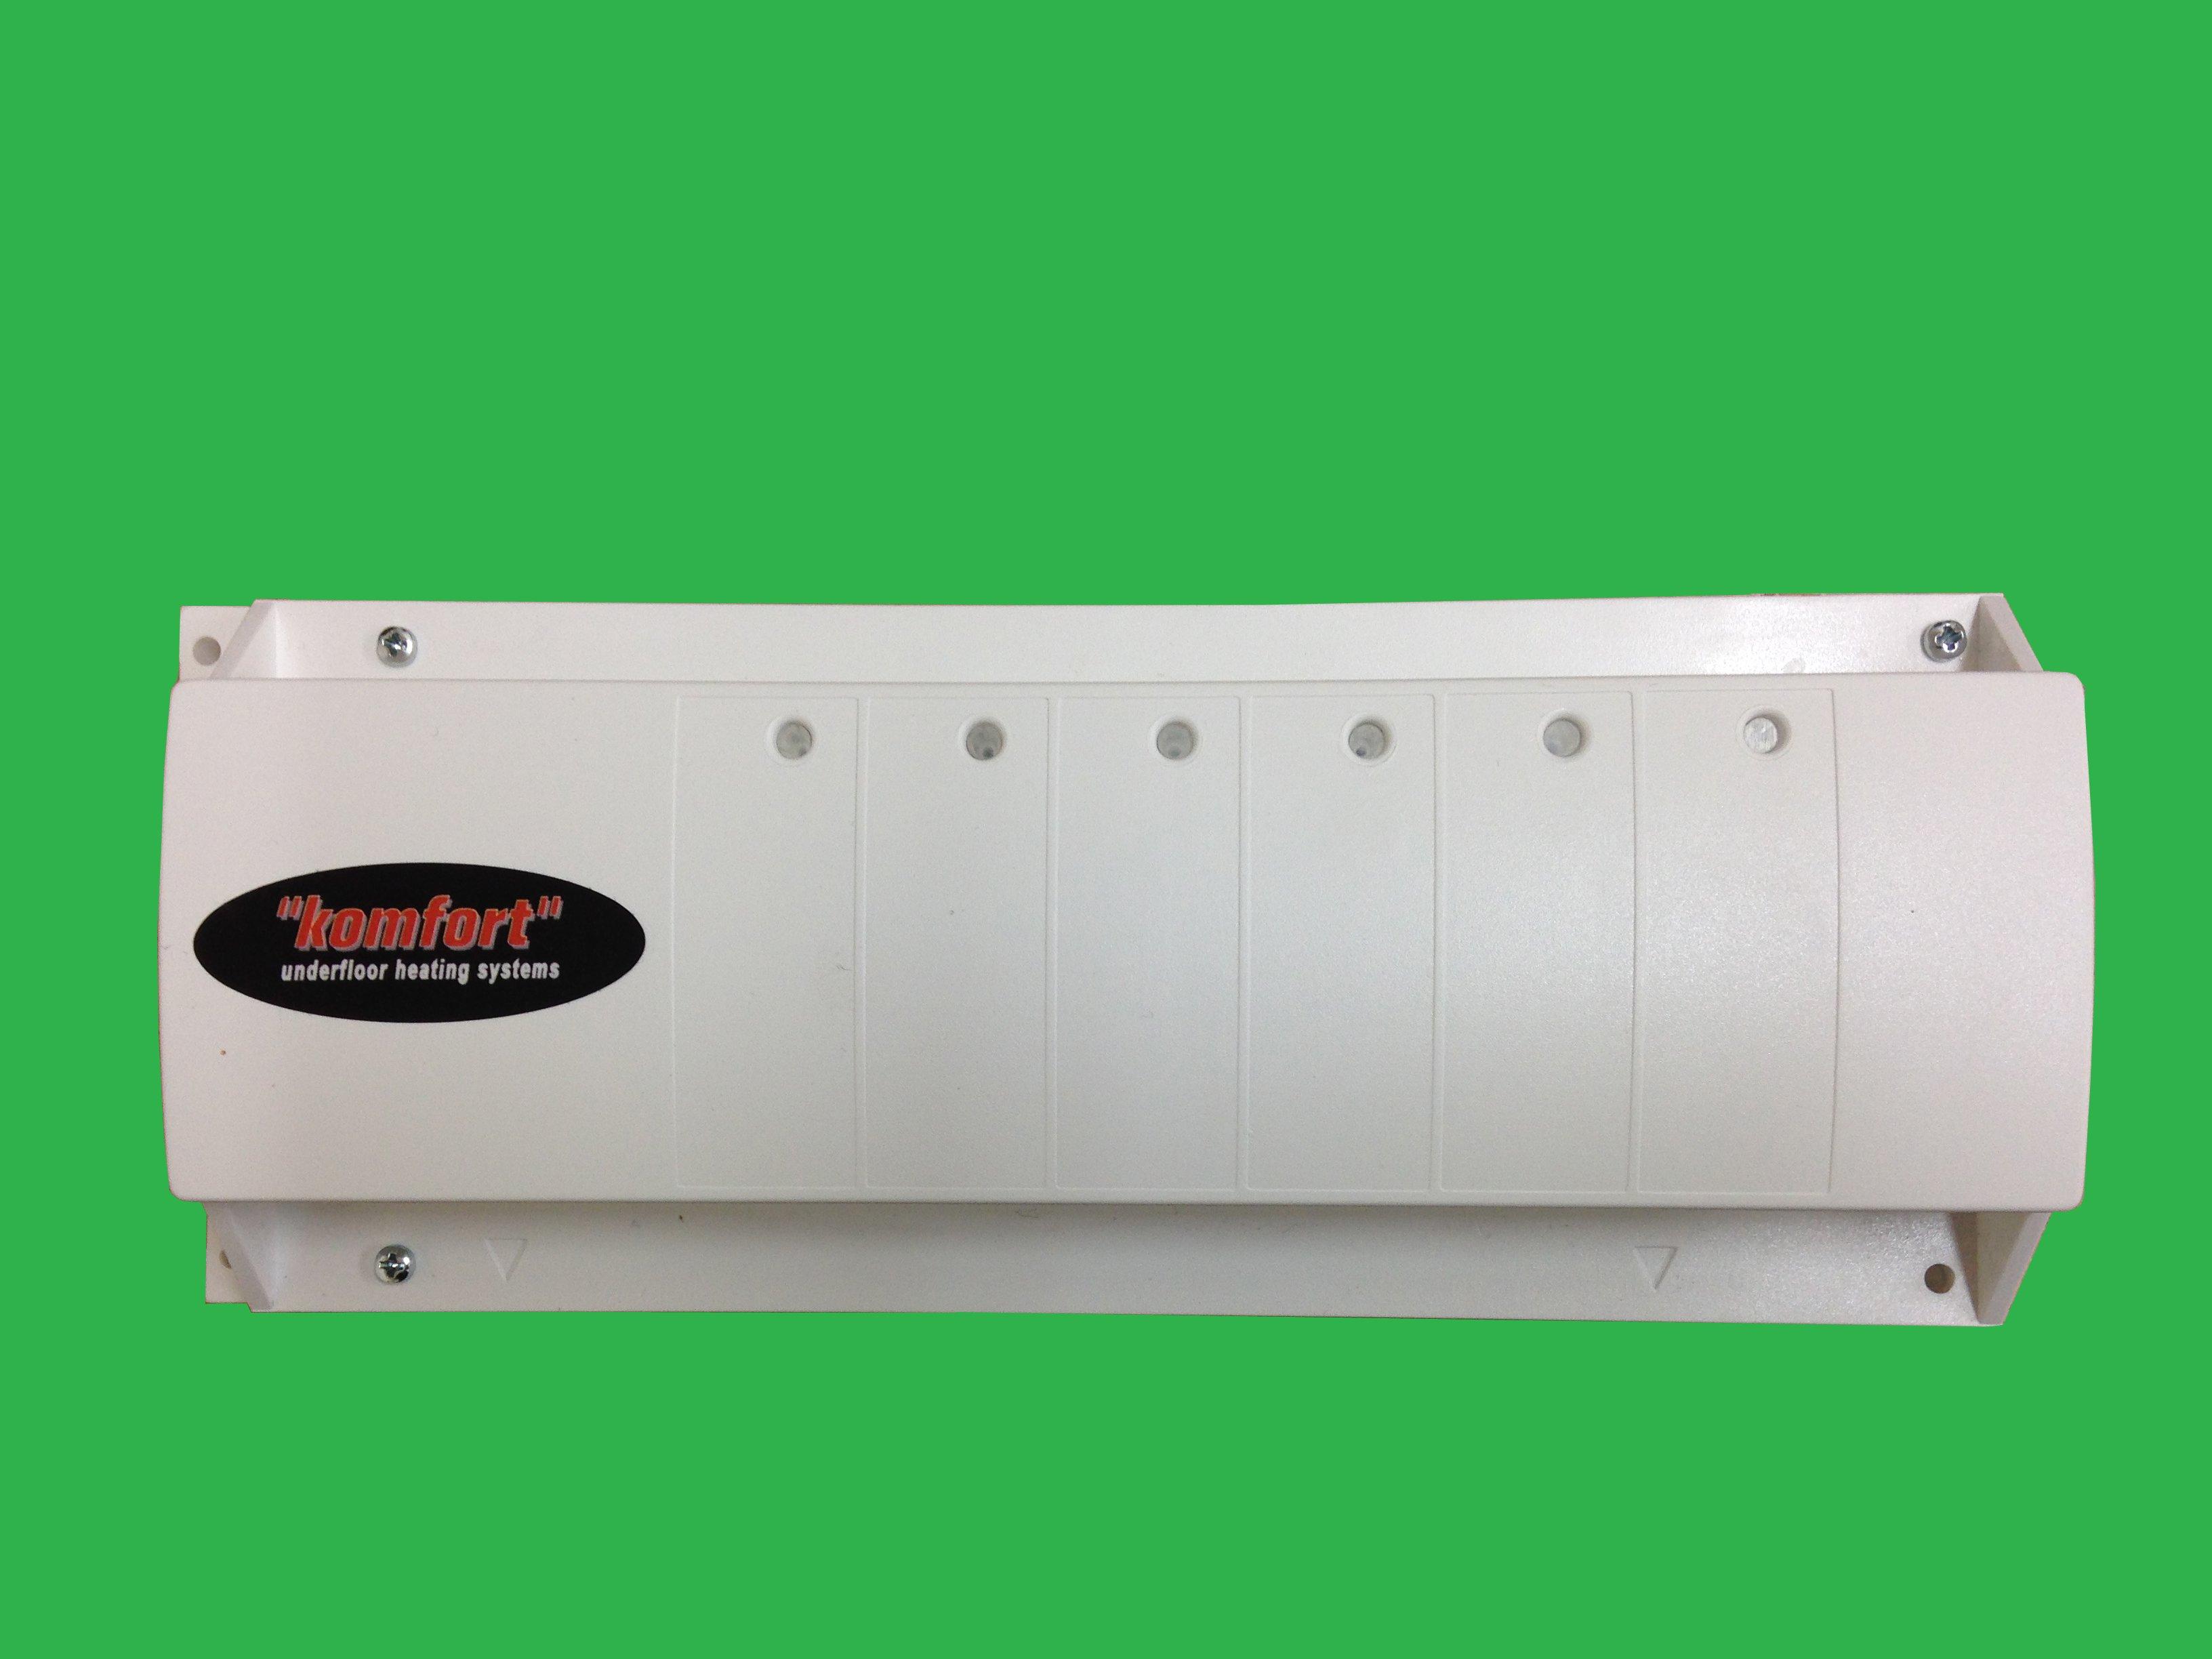 Watts / Komfort Wiring 6 Zone Master Unit 230v on basement heating, ceiling heating, boiler heating, wall heating, home heating, infloor heating, water heating, radiator heating, oil heating, gas heating,